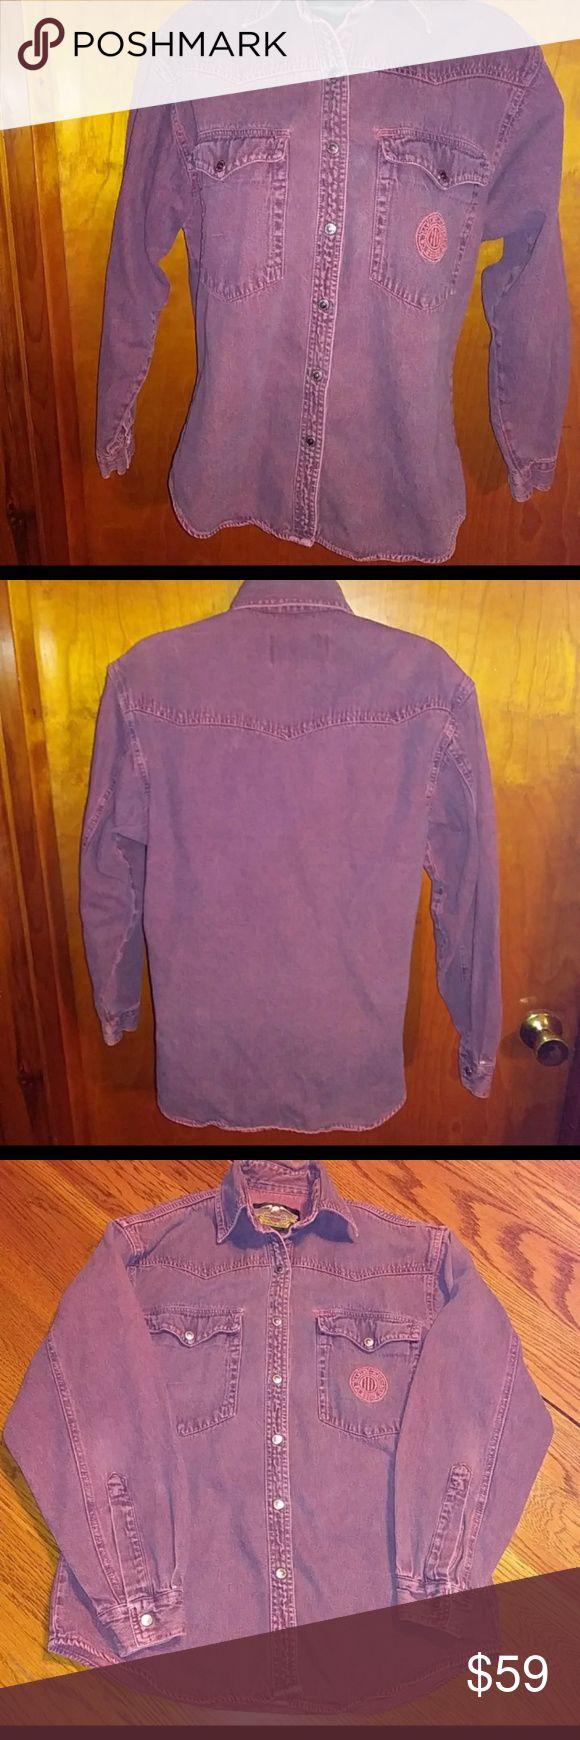 Vintage Womens Harley Shirt XS Vintage XS Womens Harley Denim Shirt Harley-David...